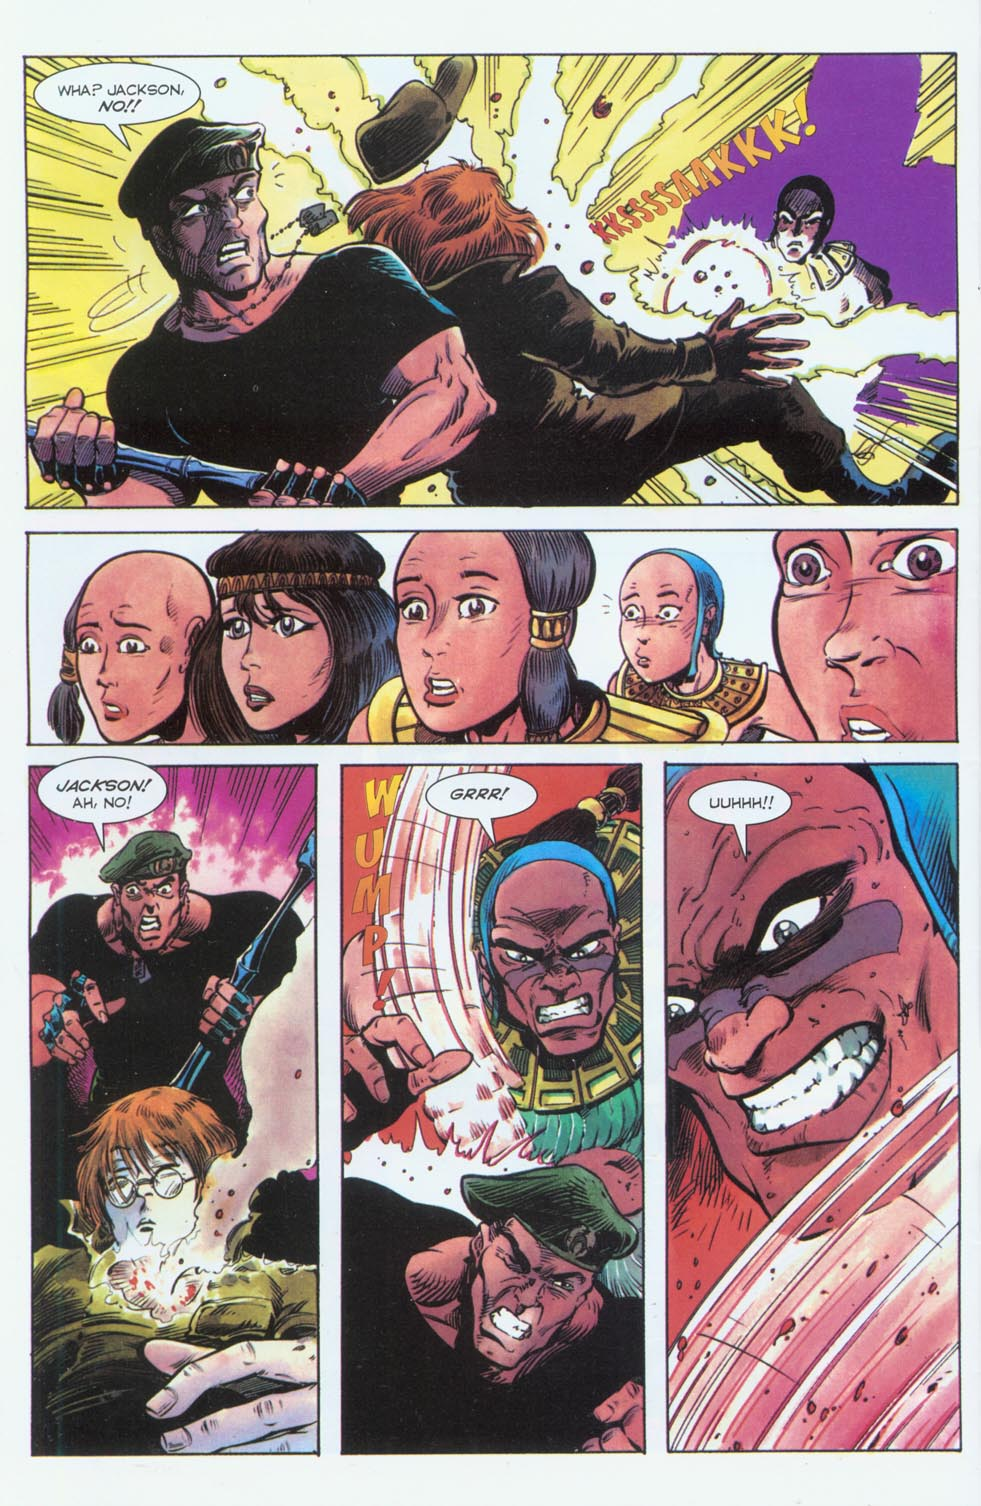 Read online Stargate comic -  Issue #3 - 6